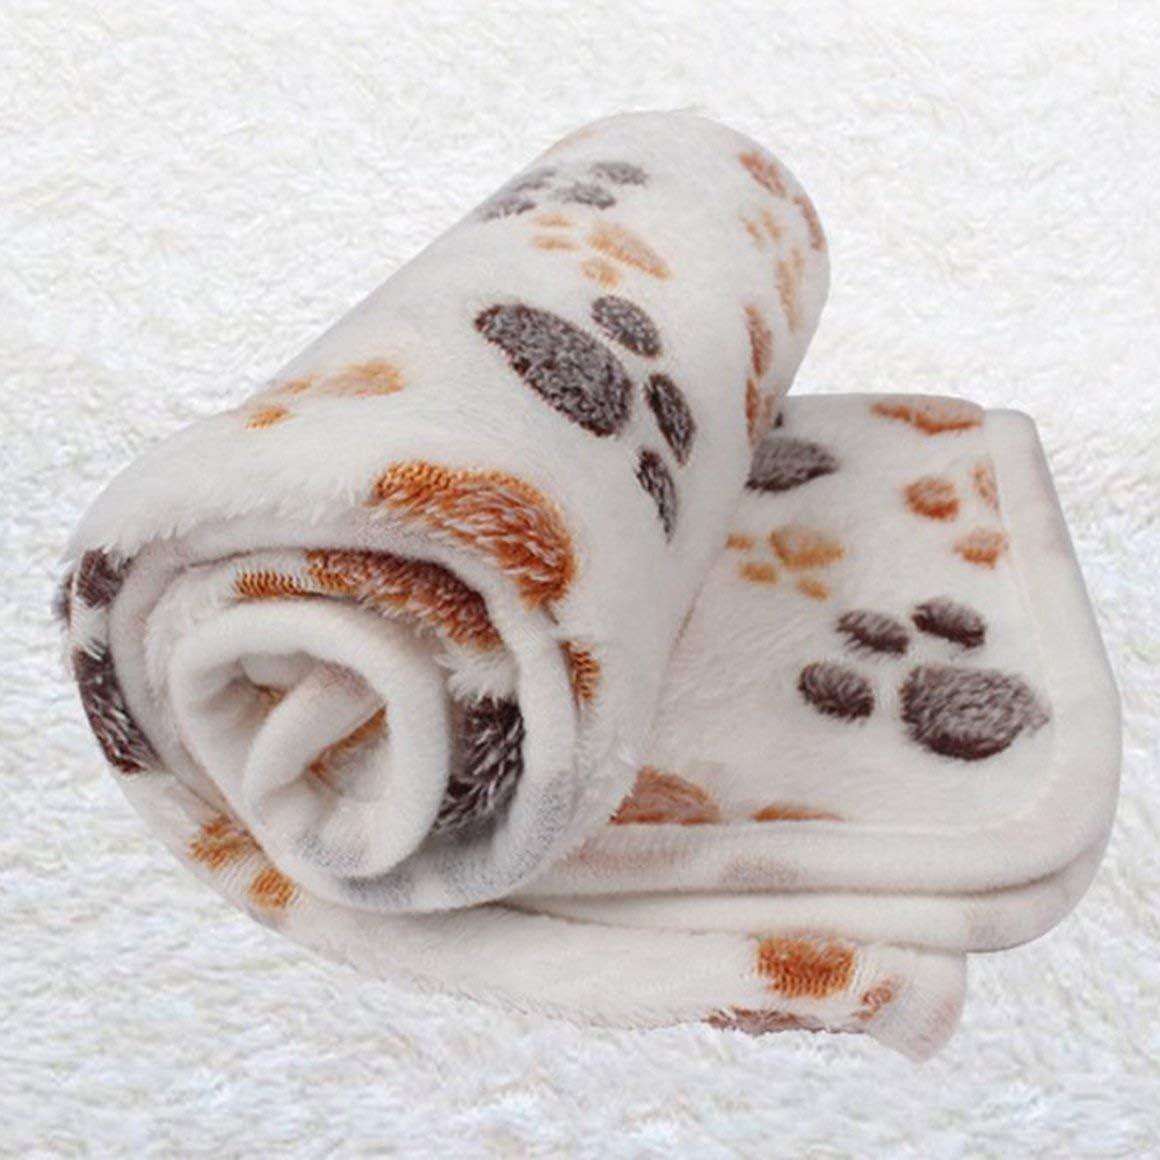 Monrodbitt Pet blanket dog blanket coral velvet pad warm padded cat cat winter sleeping pad autumn and winter dog blanket